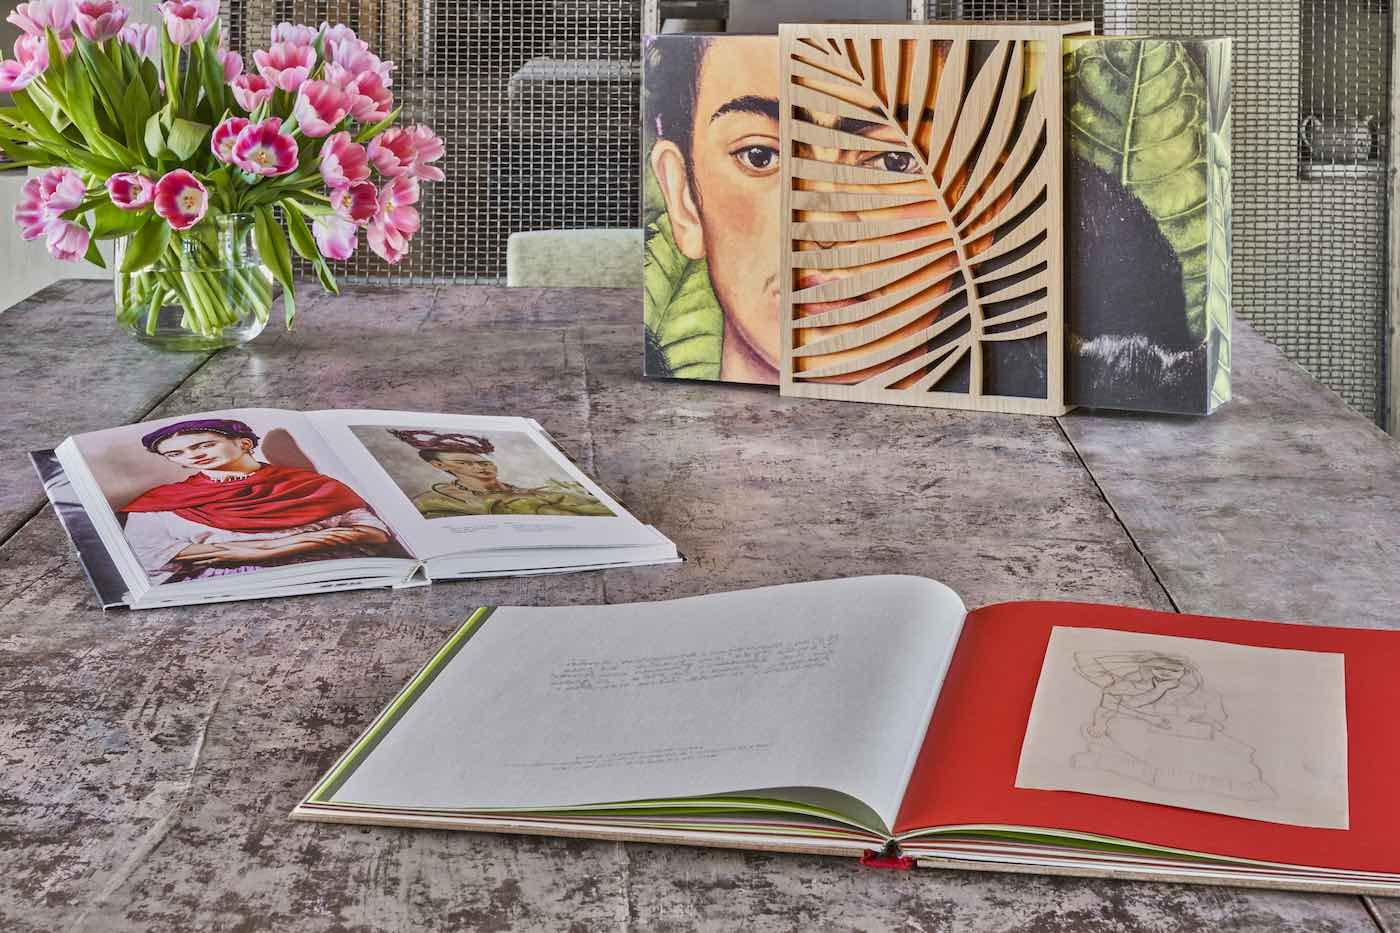 Conoce un rostro inéditode Frida Kahlo gracias a Four Seasons Hotel México City y Artika